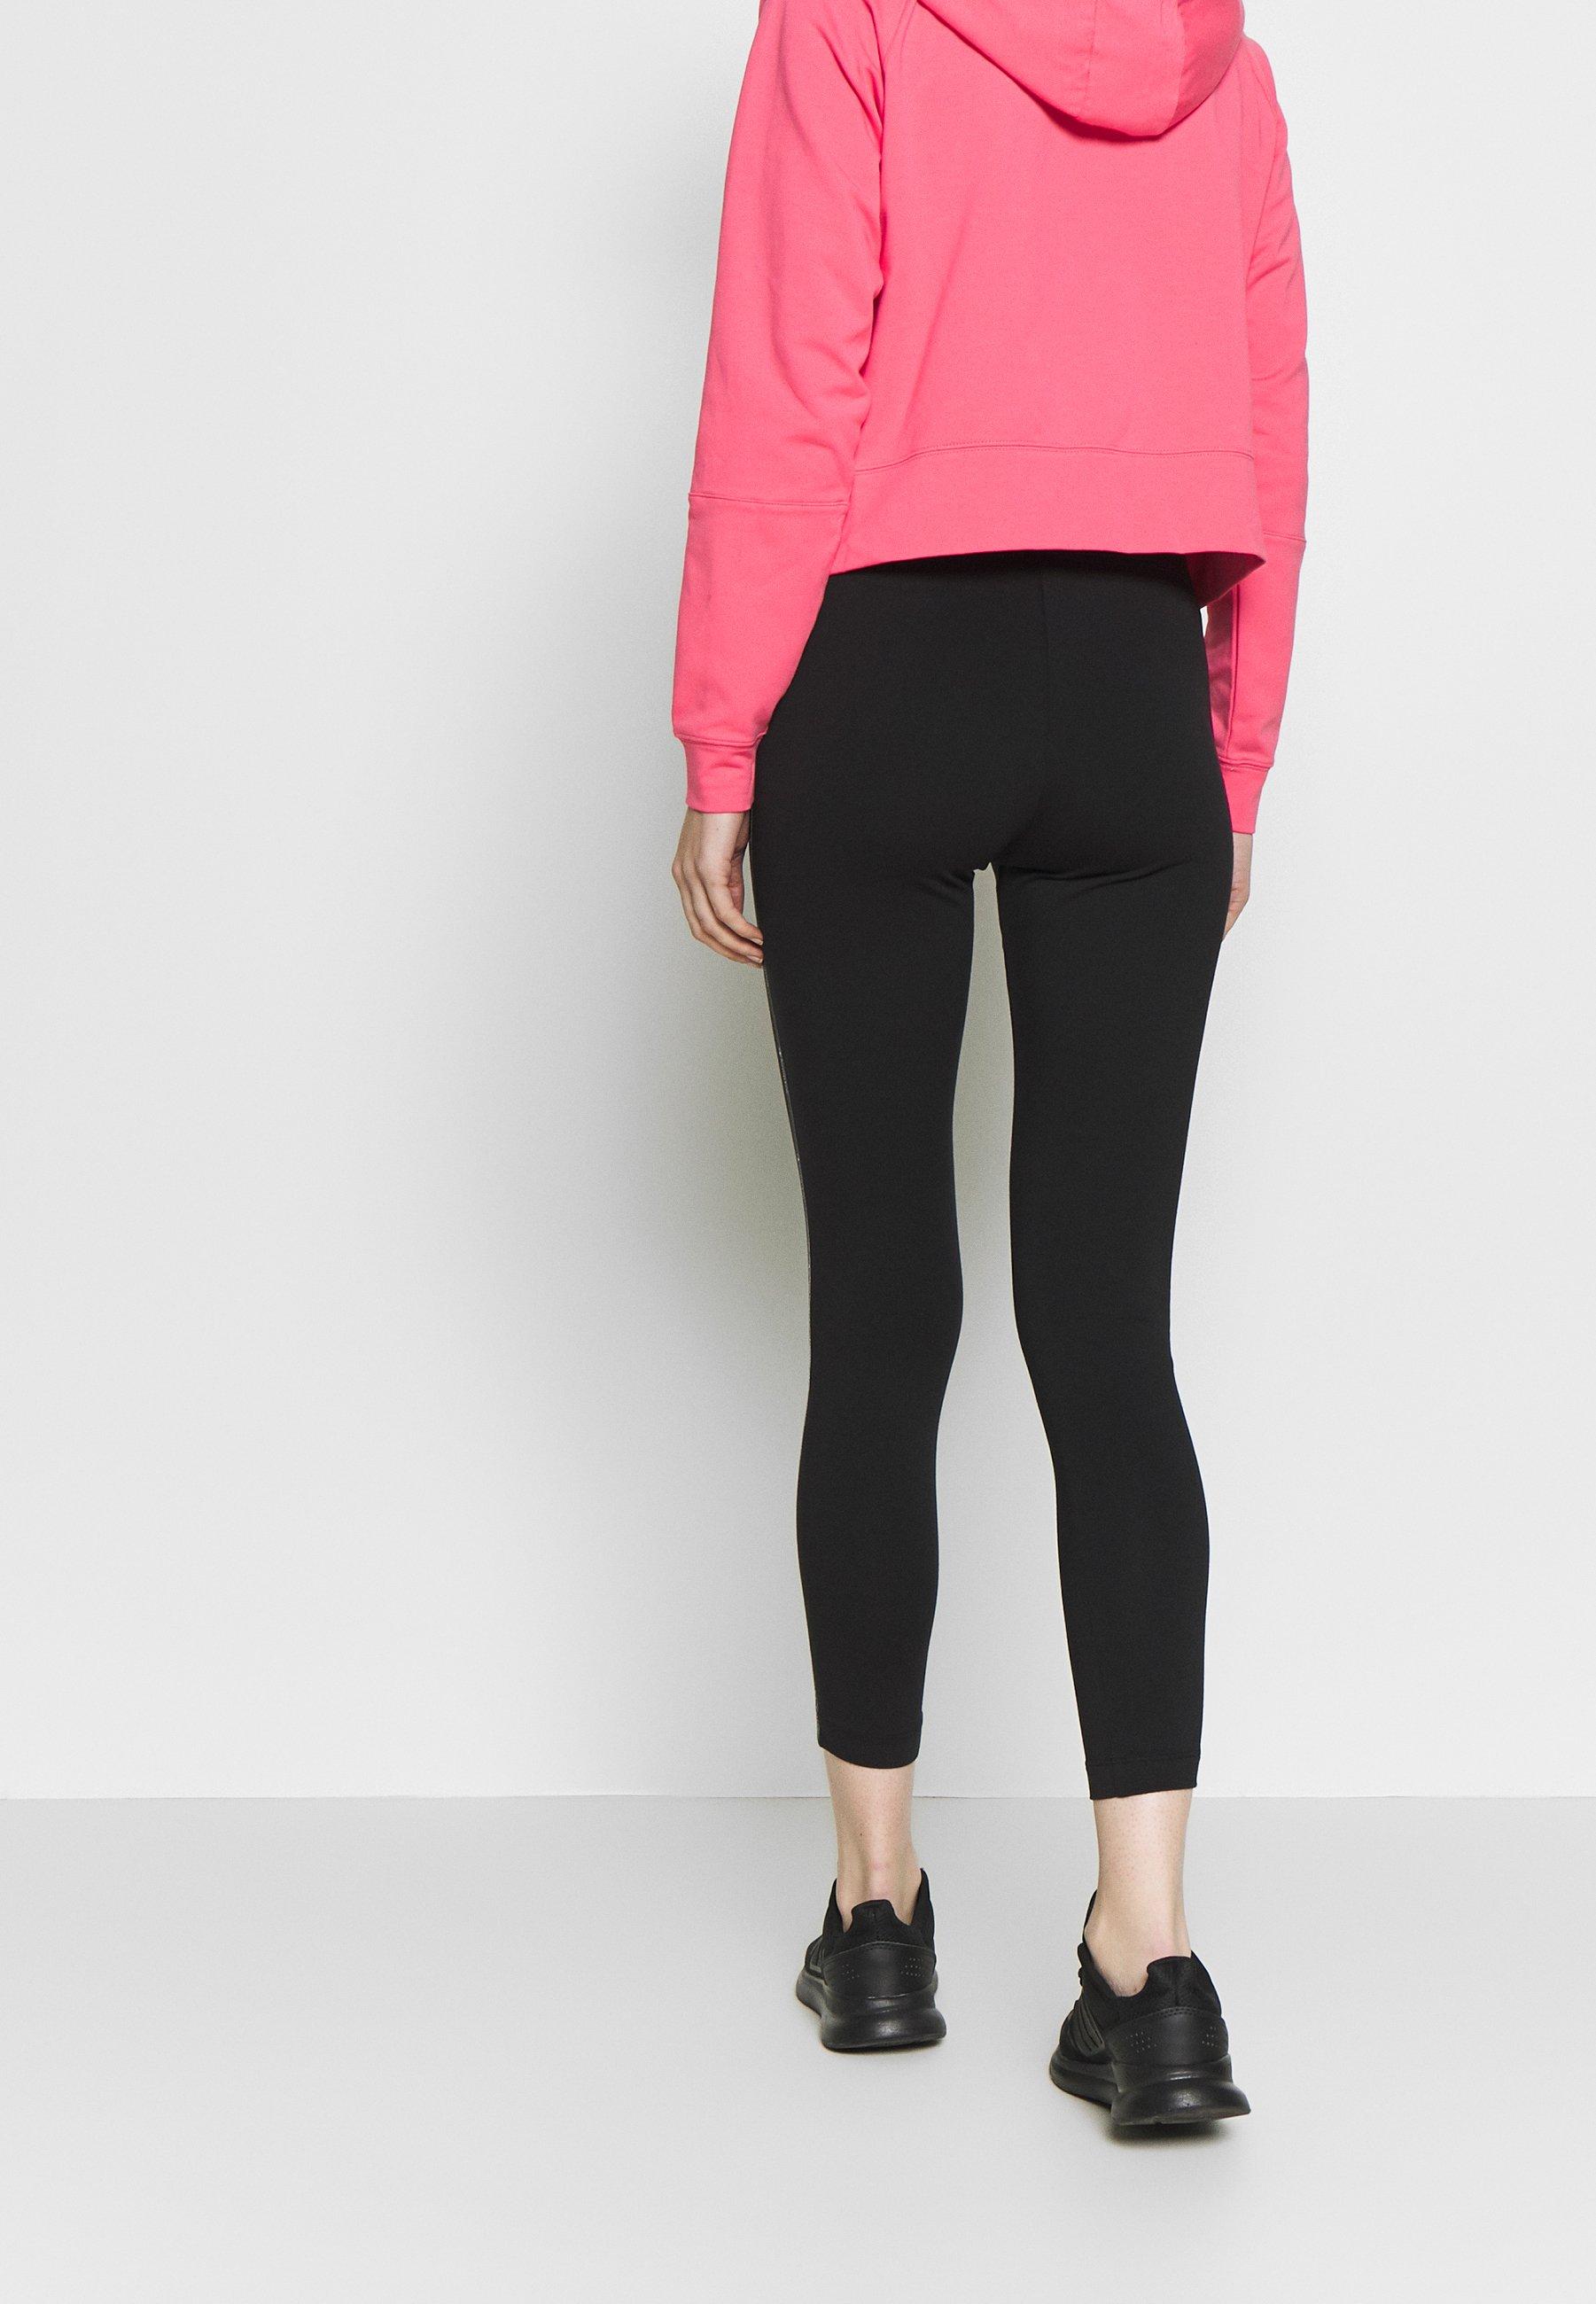 Champion Dres - pink/black